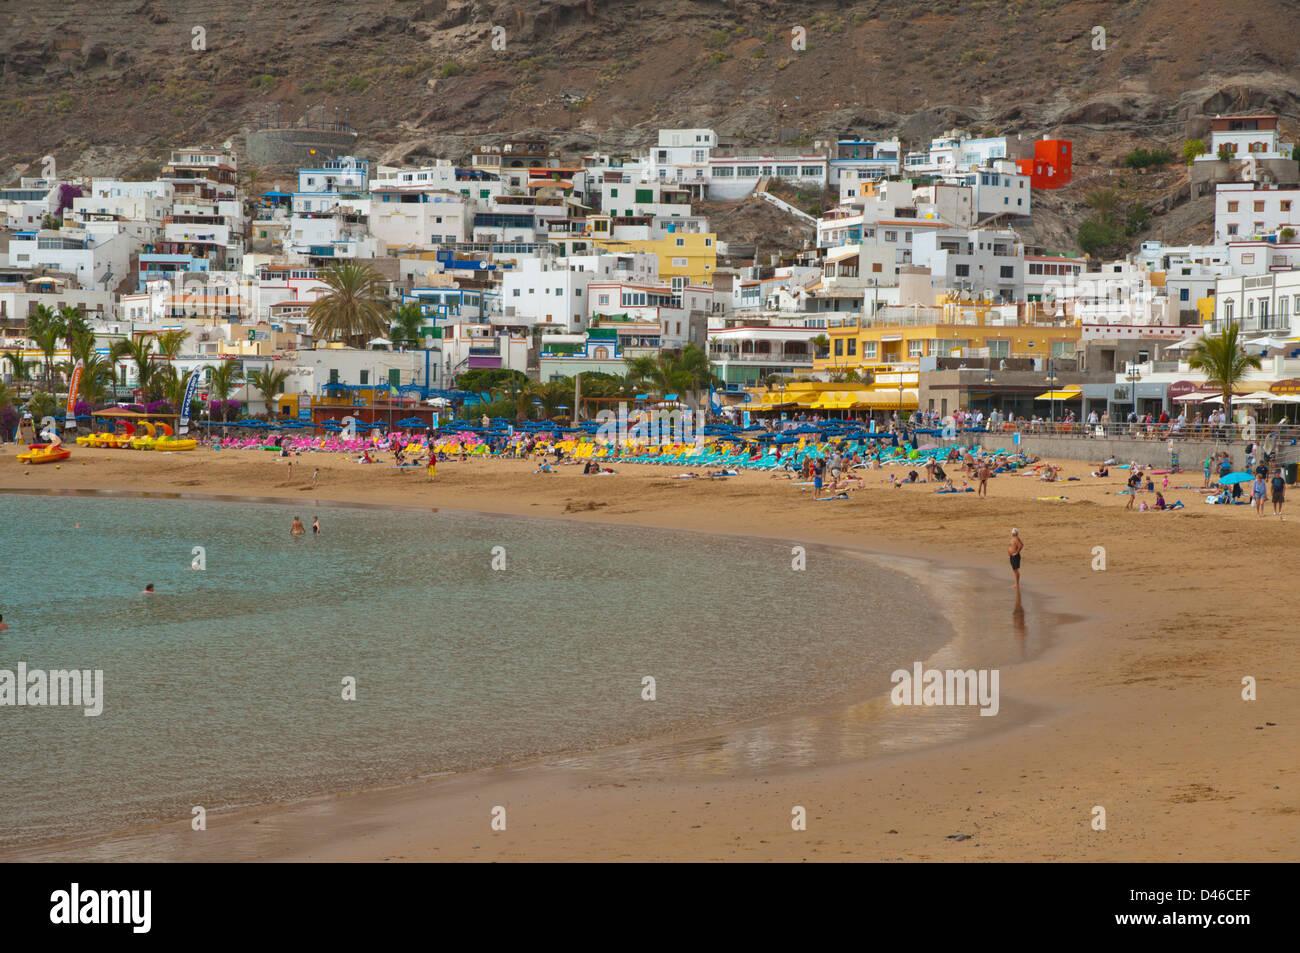 Strand in Puerto de Mogan Resort Gran Canaria Insel der Kanarischen Inseln-Spanien-Europa Stockbild